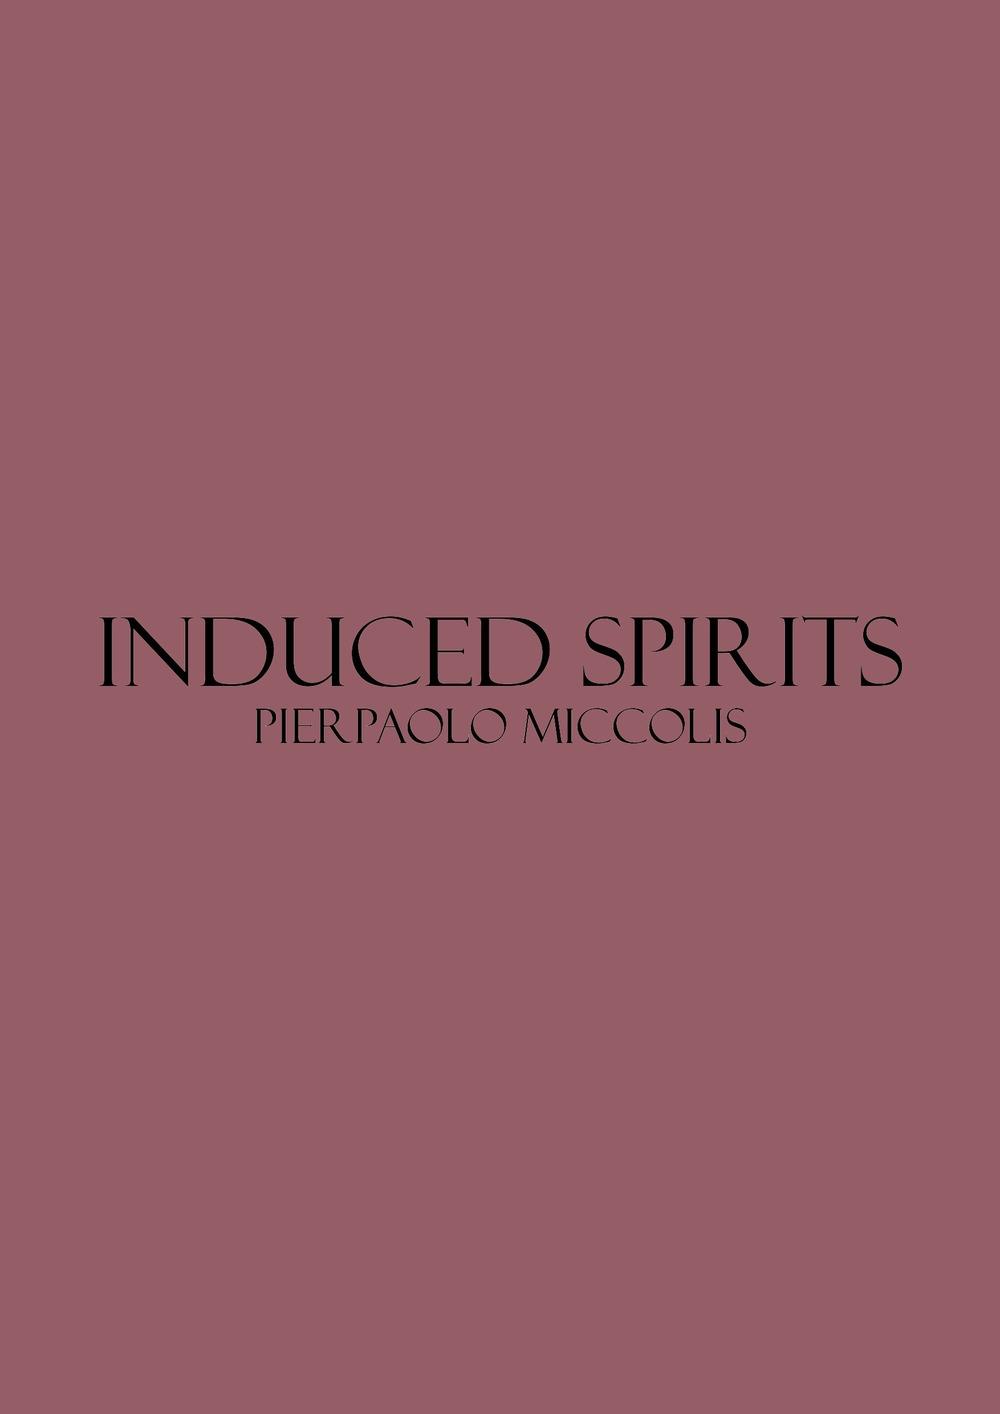 Induced spirits. Catalogo della mostra (Bari, 2-3 marzo 2018)